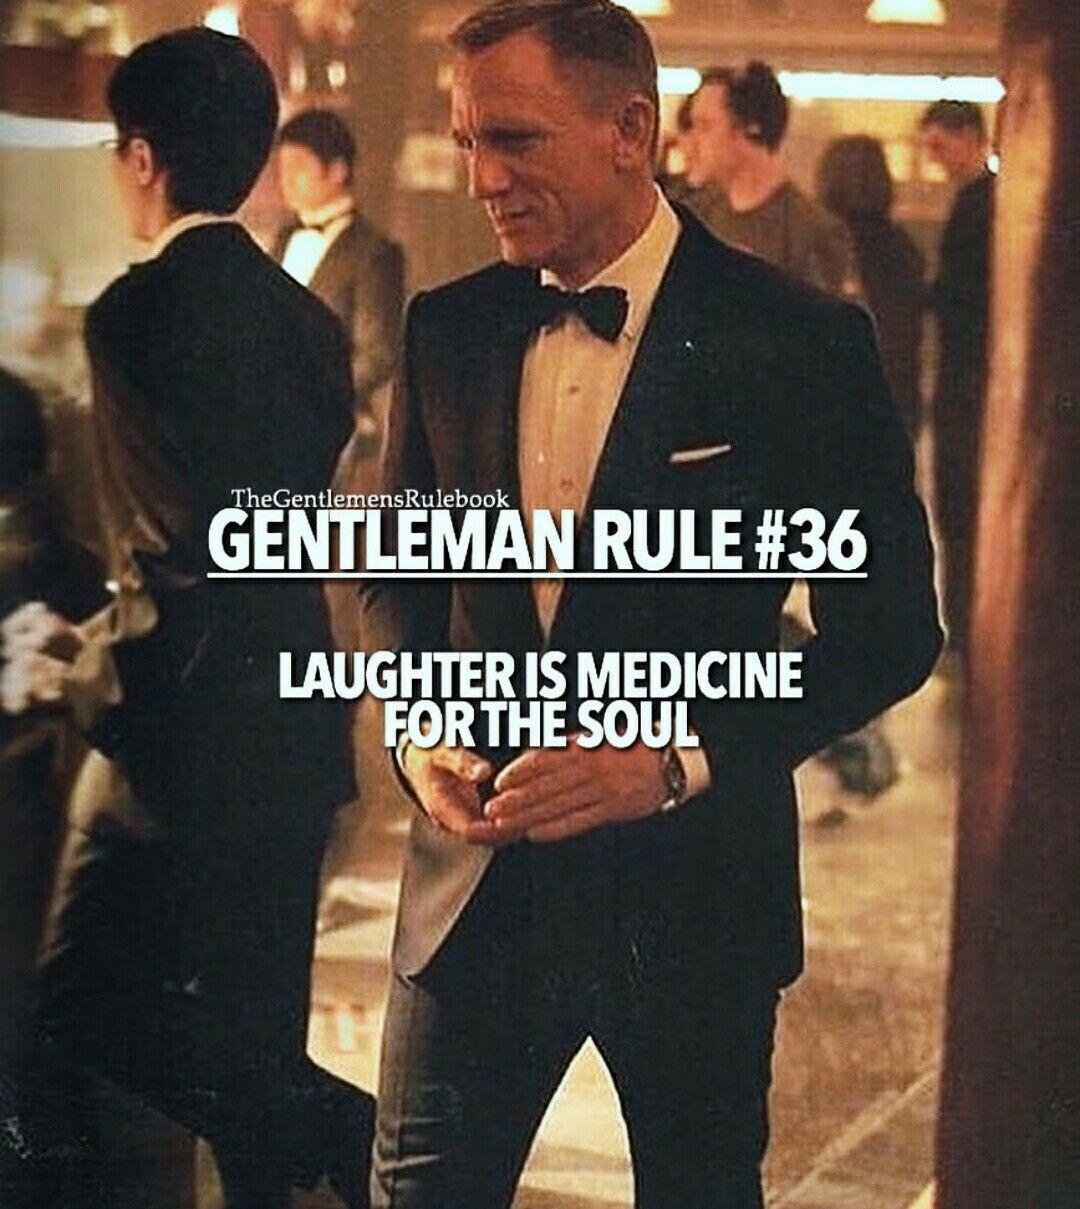 #chivalryquotes